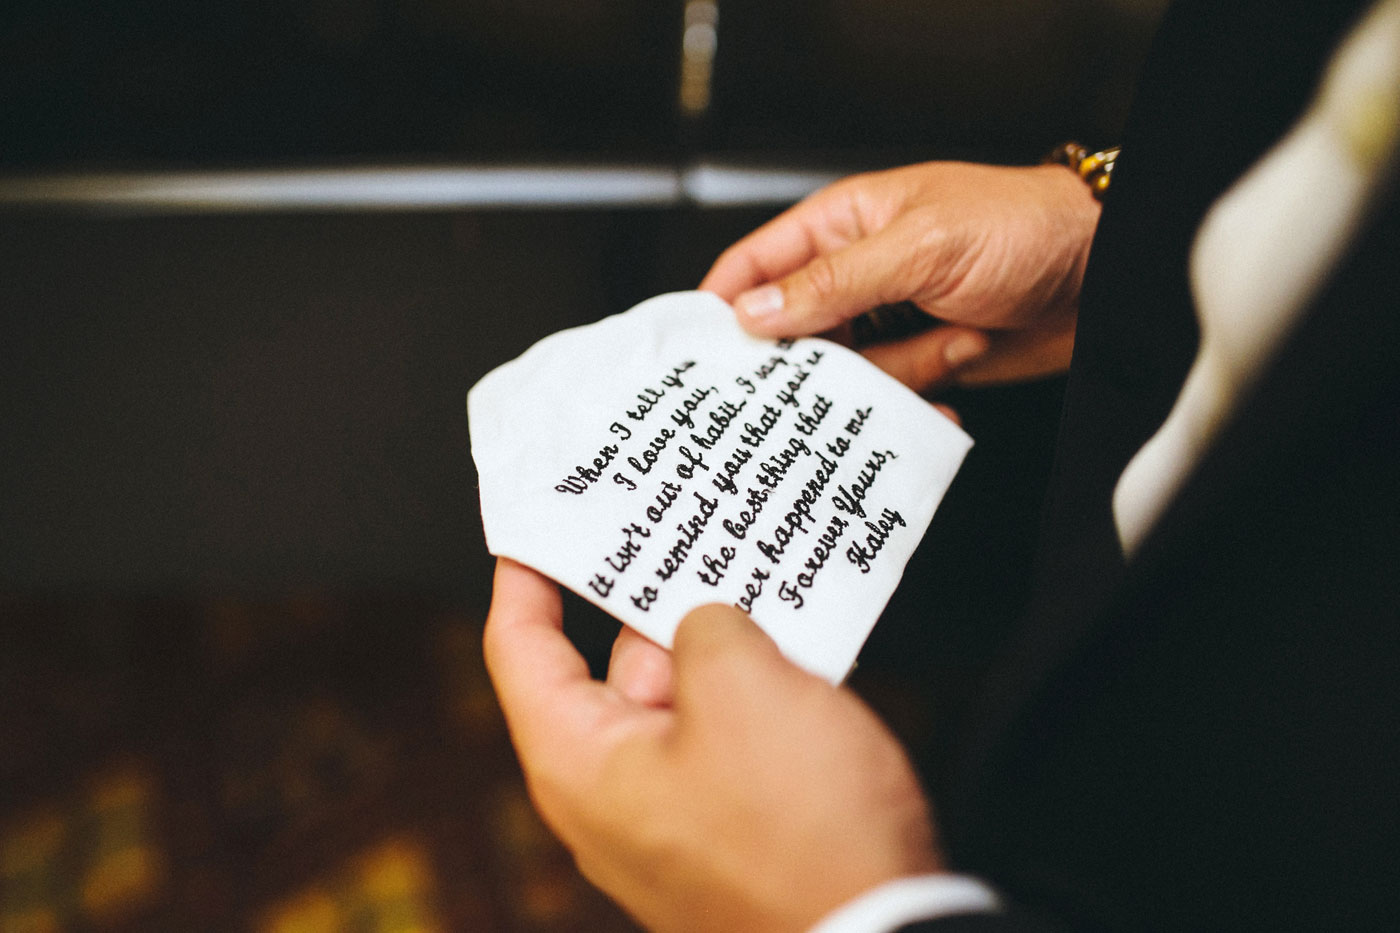 Me & Mr. Jones Wedding, Black Tie Wedding, Calvin Klein Black Slim Fit Tuxedo, Monogram Dress Shirt, Classic Groom, Gift for Groom, Embroidered Handkerchief